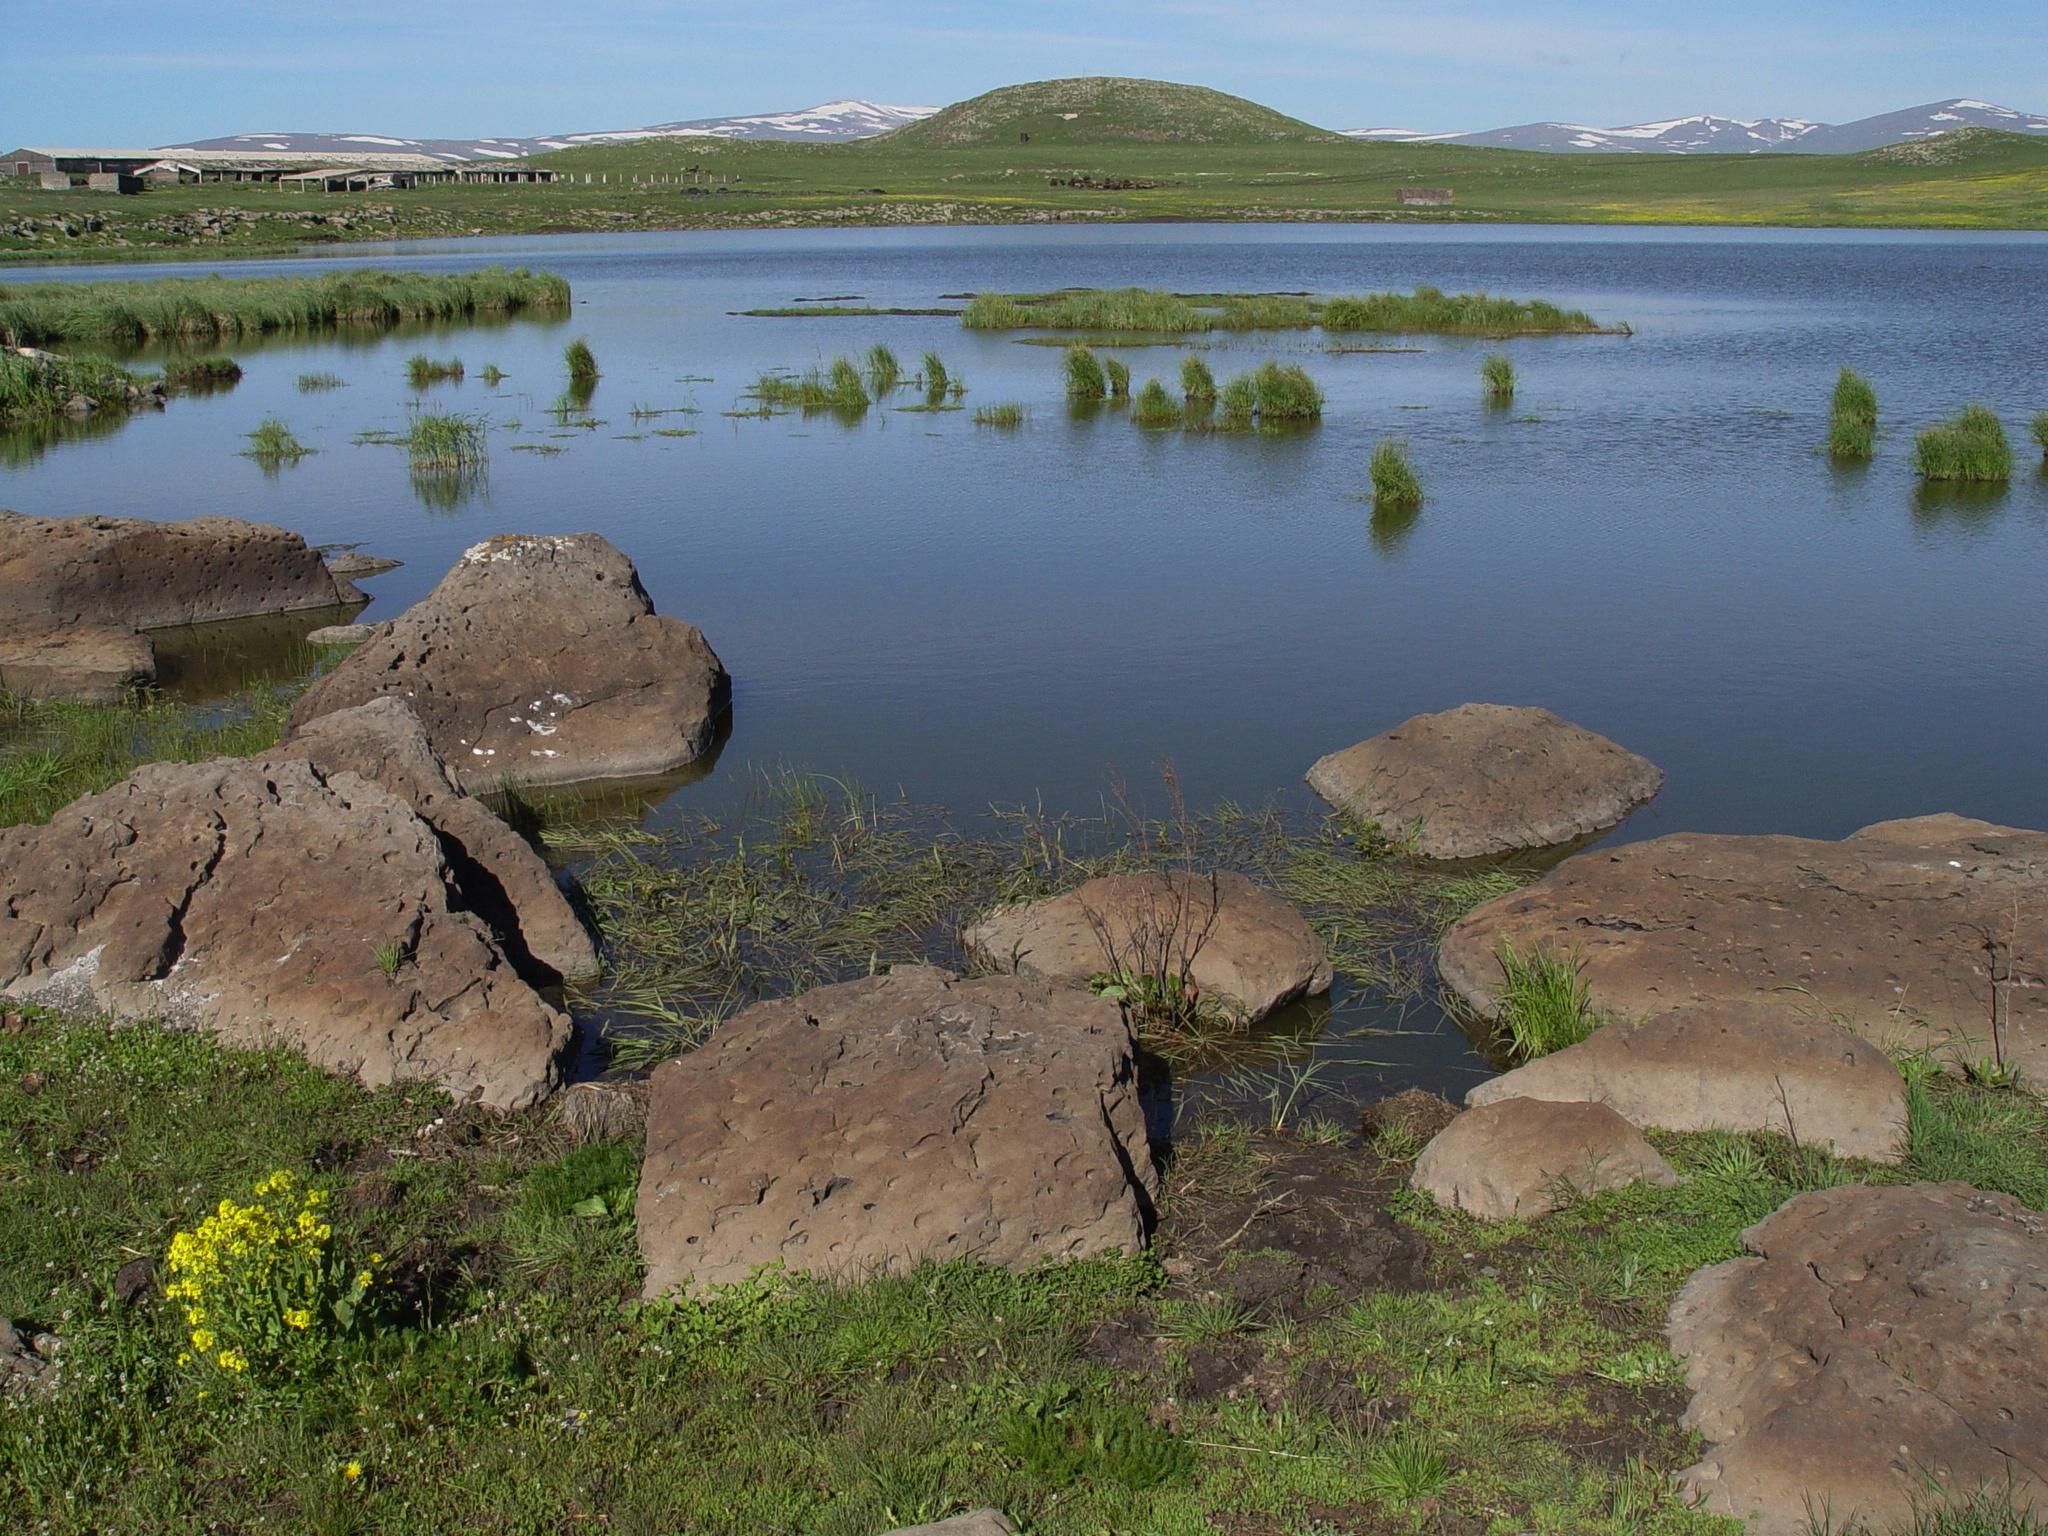 Arpi Lake